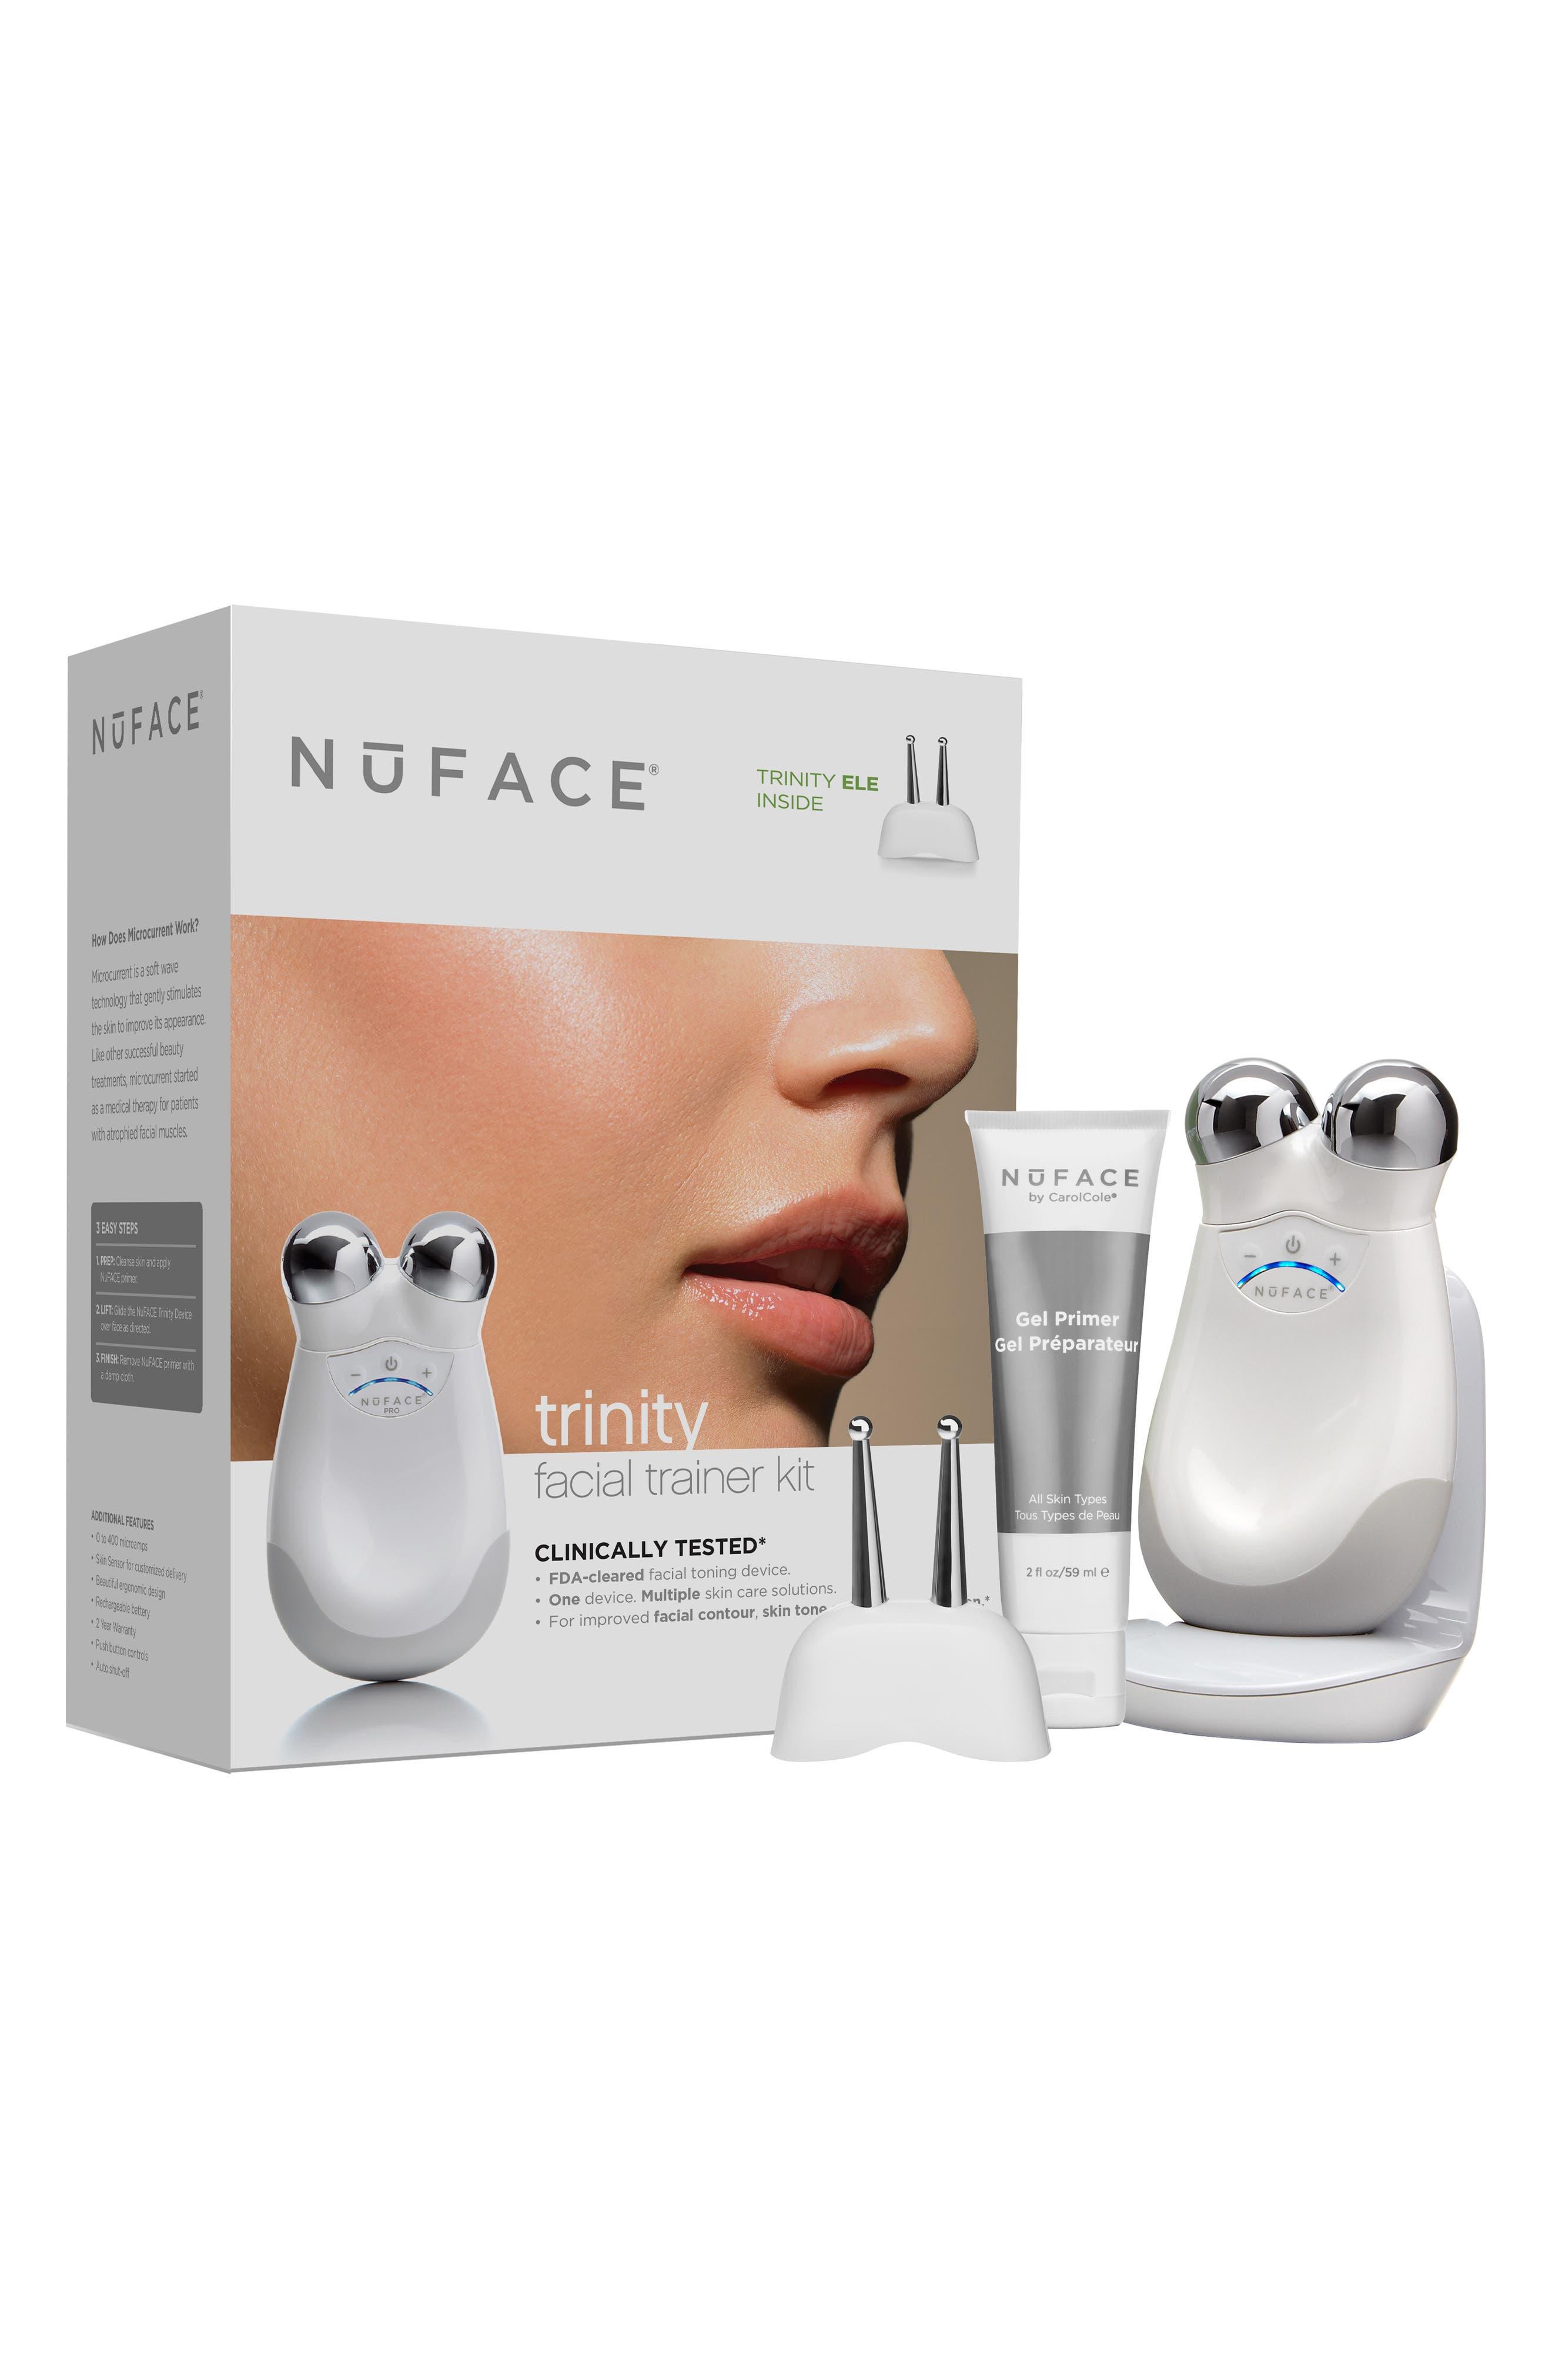 Alternate Image 1 Selected - NuFACE® 'Trinity®' Facial Trainer Kit + Trinity Eye & Lip Enhancer Attachment ($474 Value)